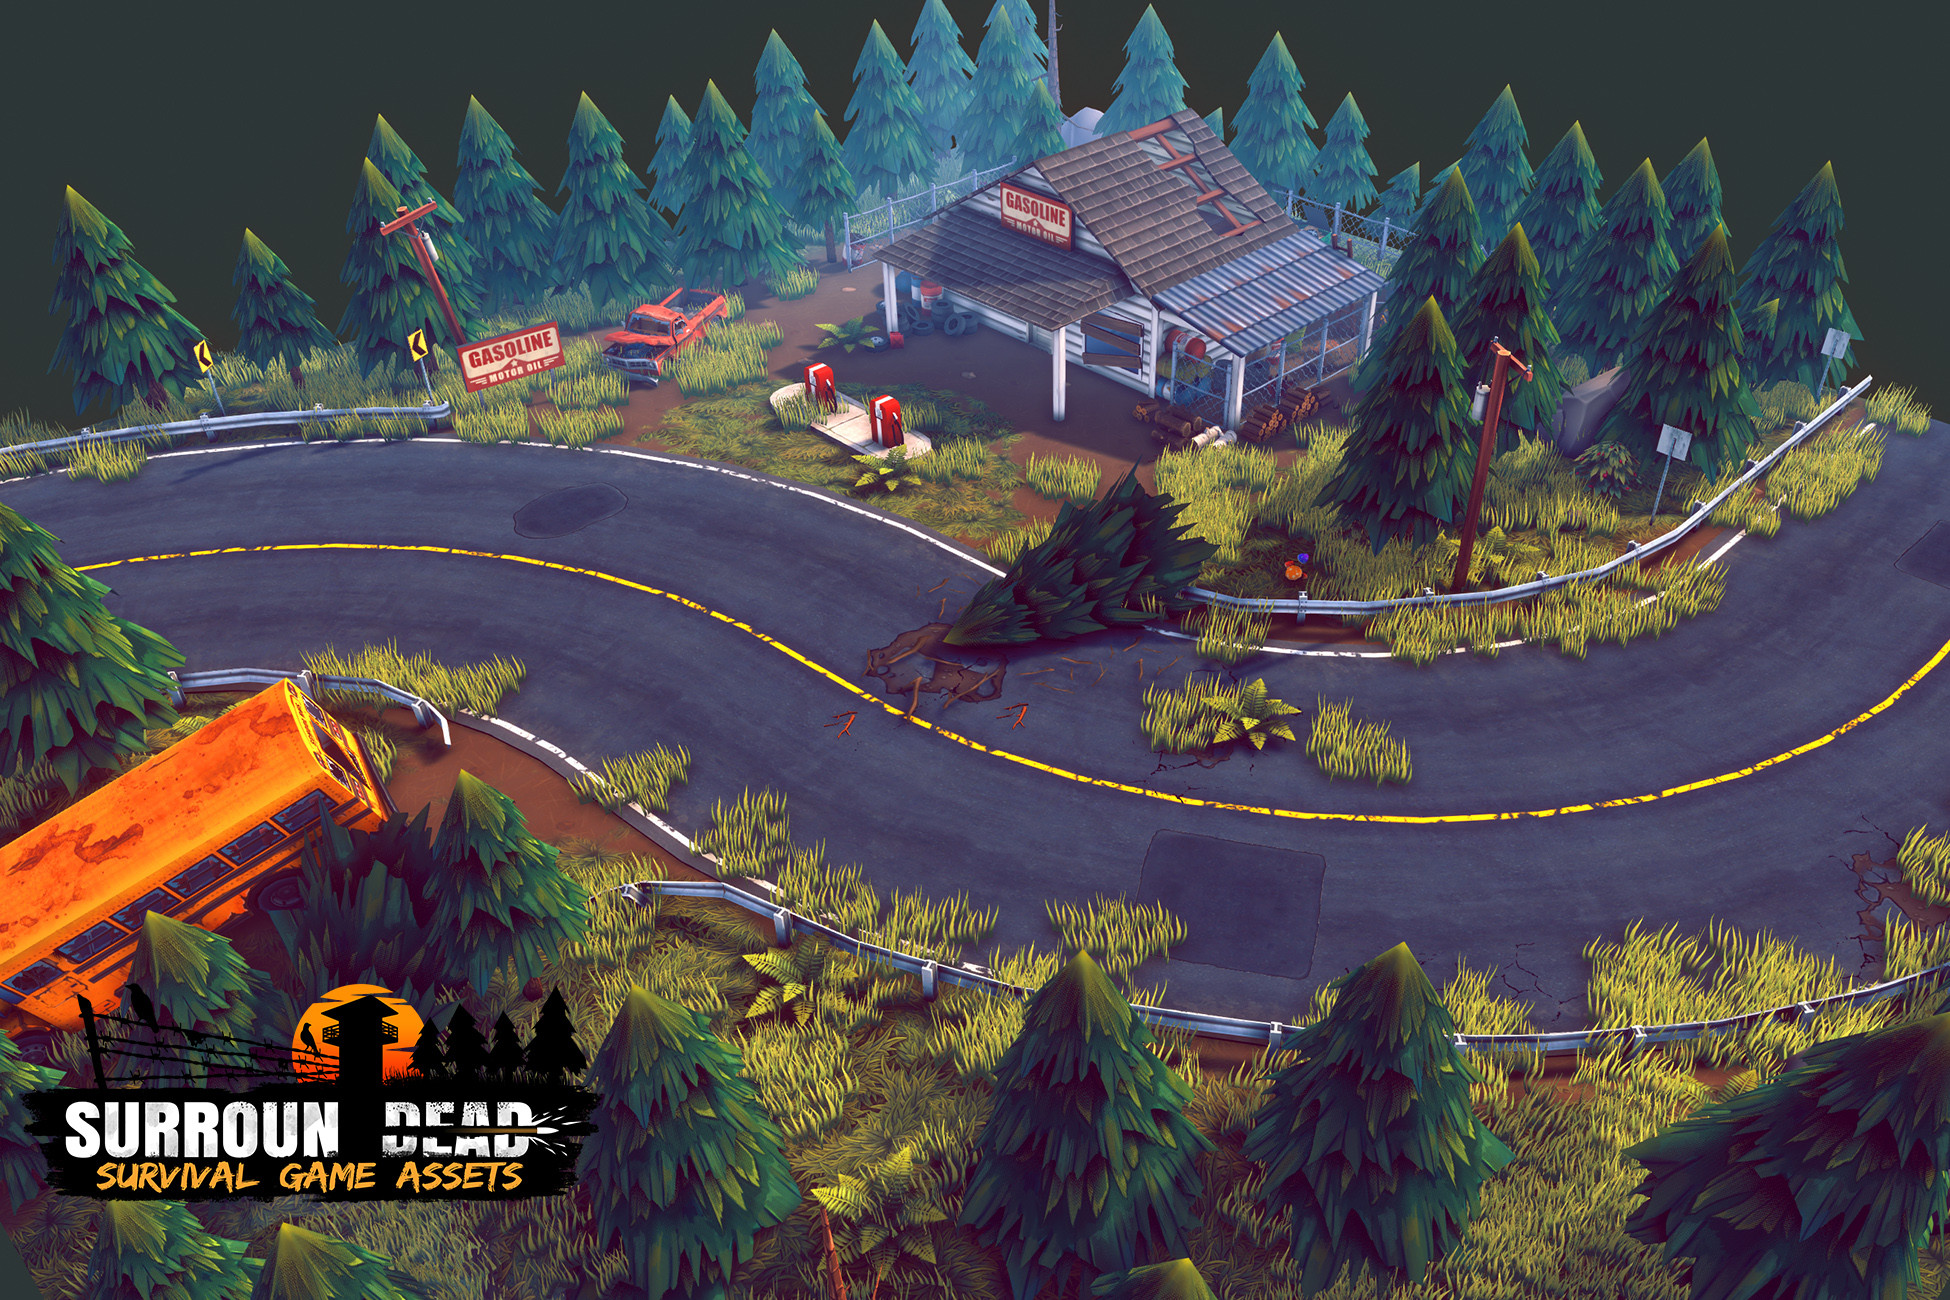 SurrounDead - Survival Game Assets v3.5